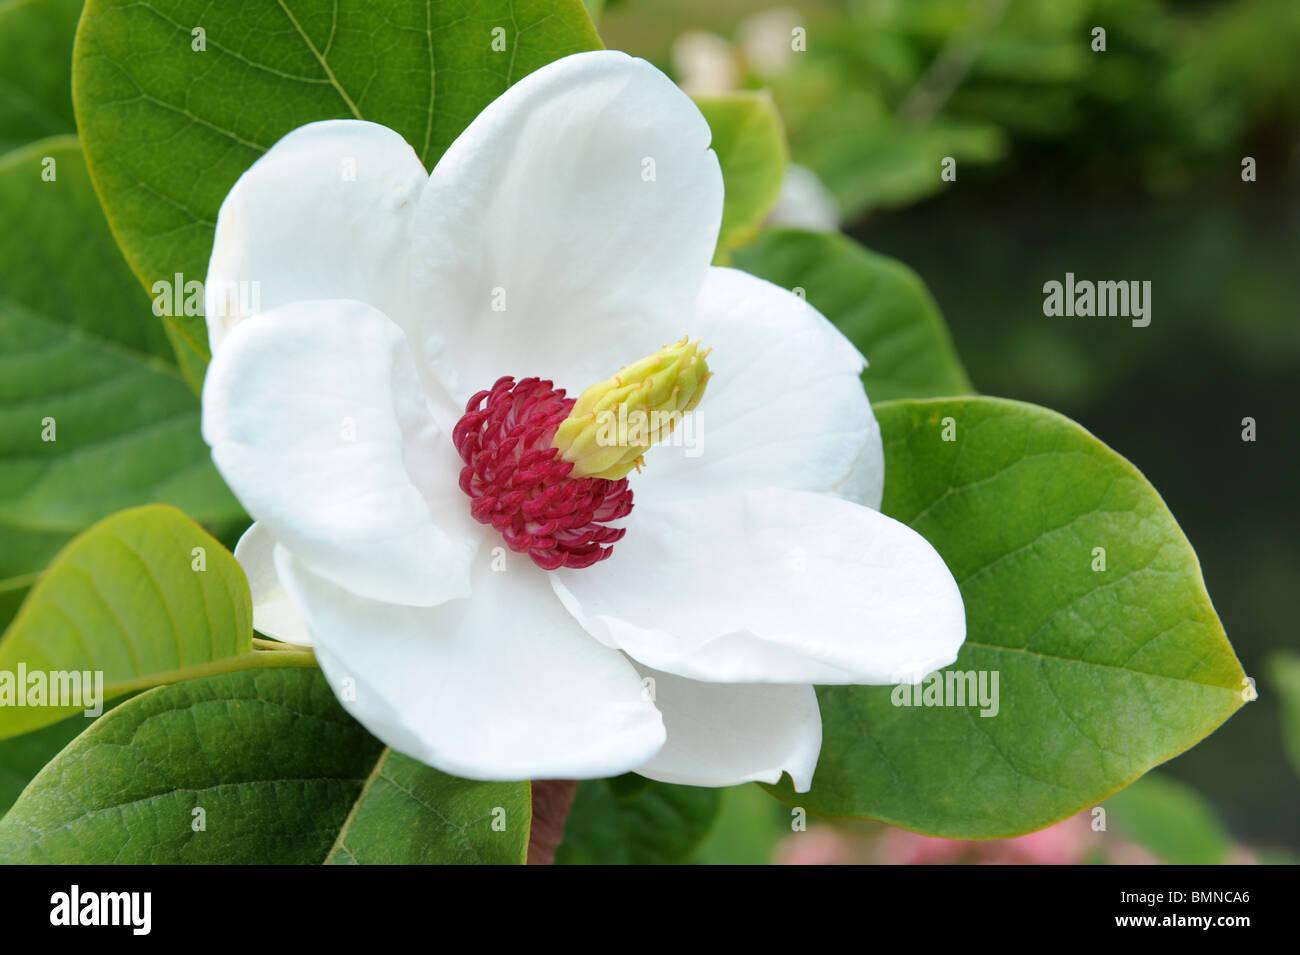 image gallery siebold 39 s magnolia. Black Bedroom Furniture Sets. Home Design Ideas